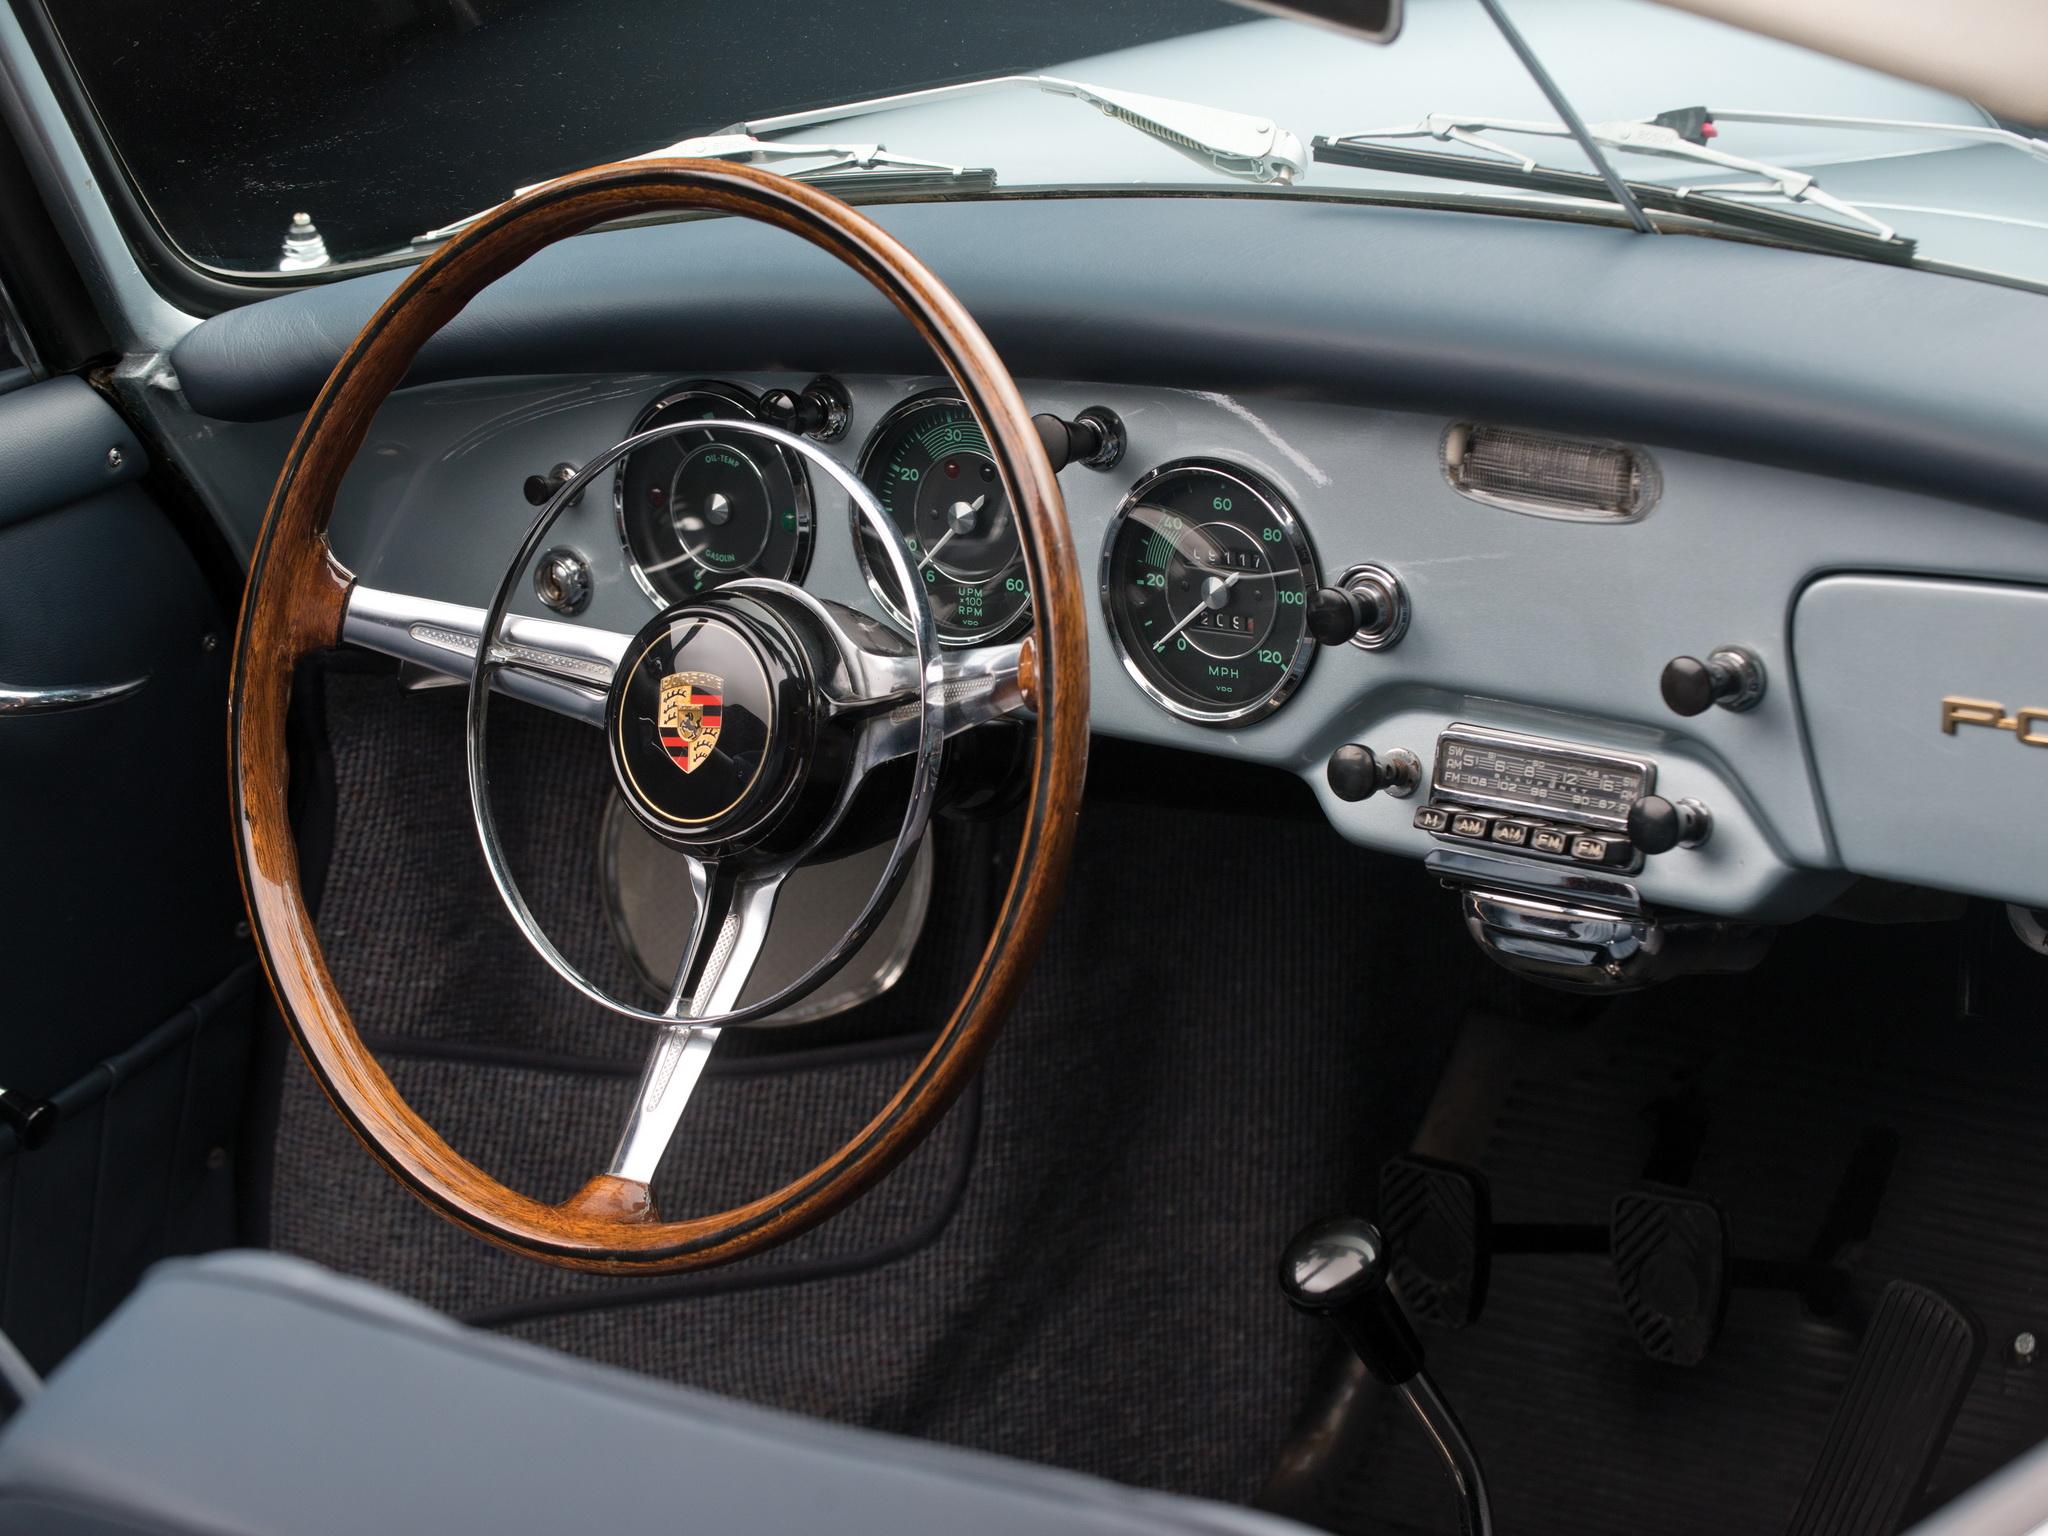 1960 porsche 356b 1600 cabriolet reutter t 5 classic. Black Bedroom Furniture Sets. Home Design Ideas